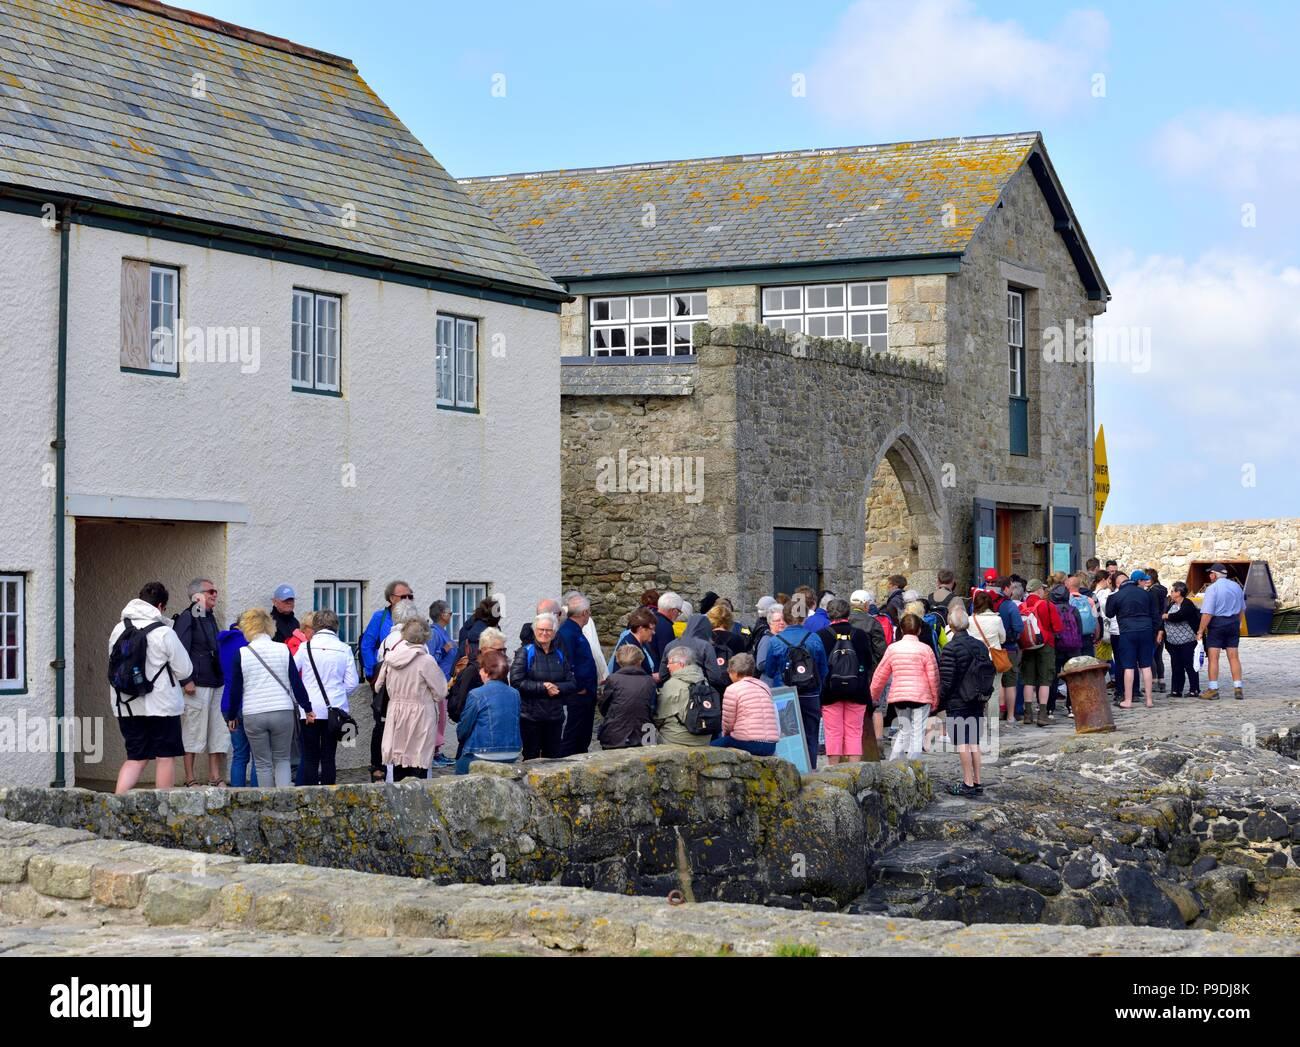 St Michael's Mount,Karrek Loos yn Koos,Marazion,Cornwall,England,uk Stock Photo